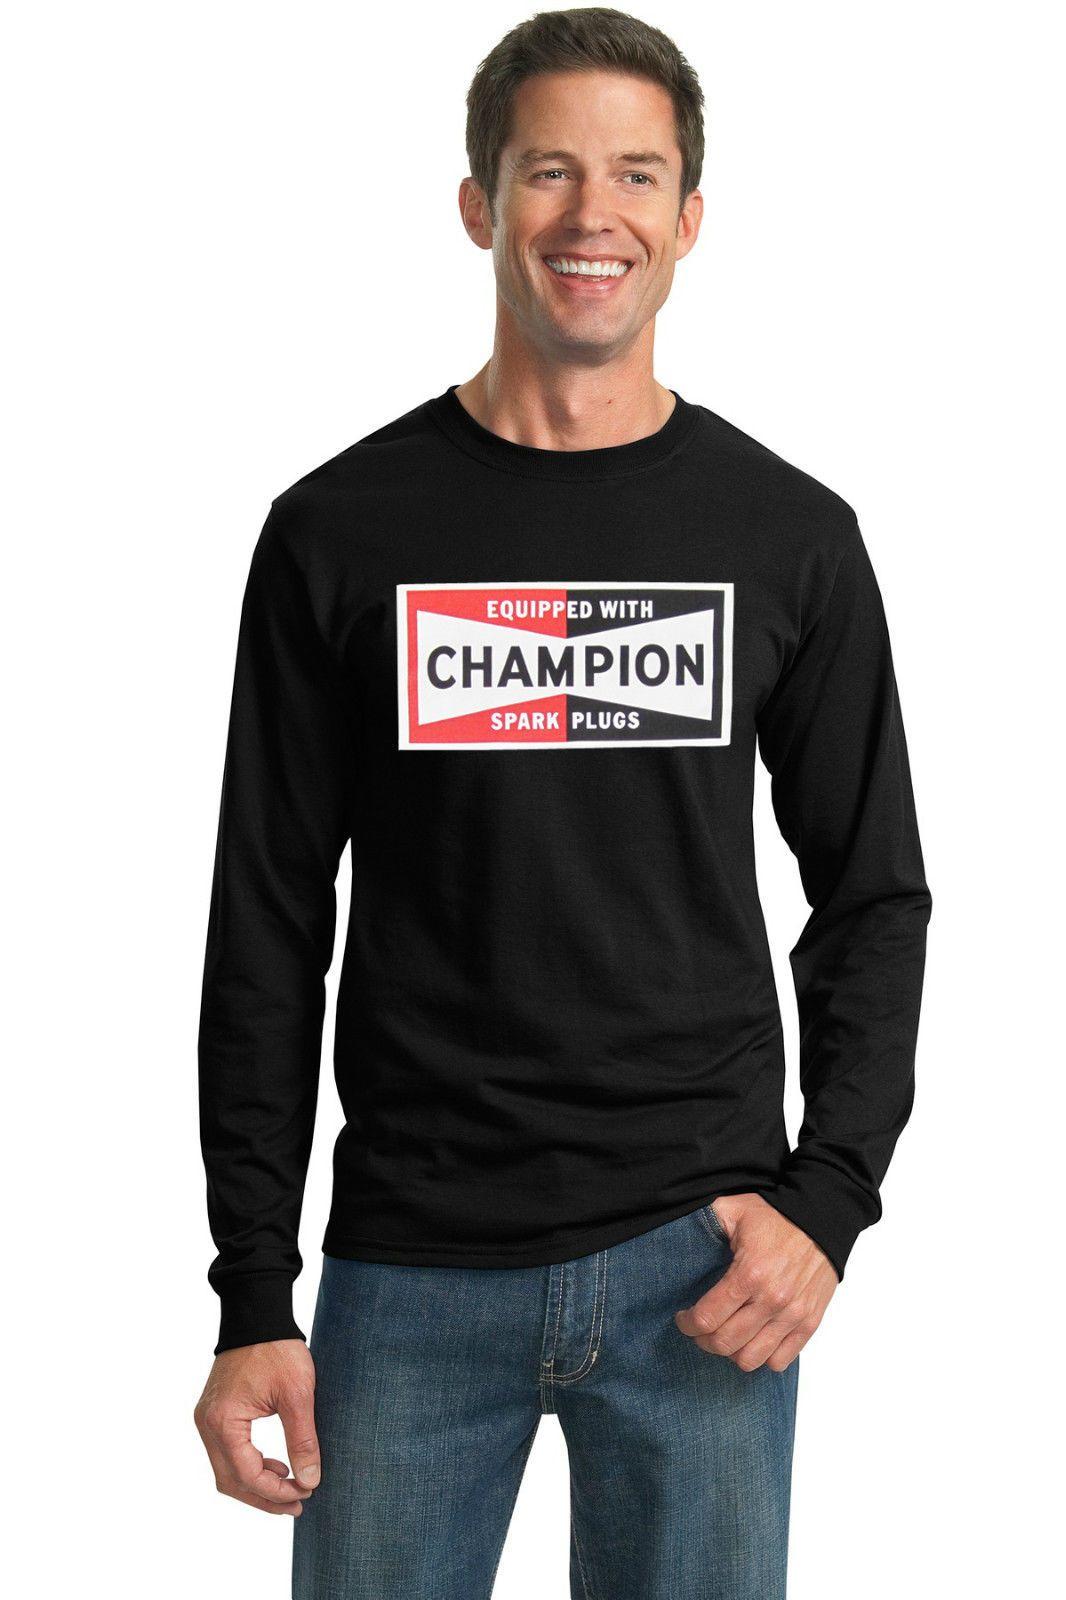 Champion Spark Plugs Retro T-Shirt Jersey Vintage Sign